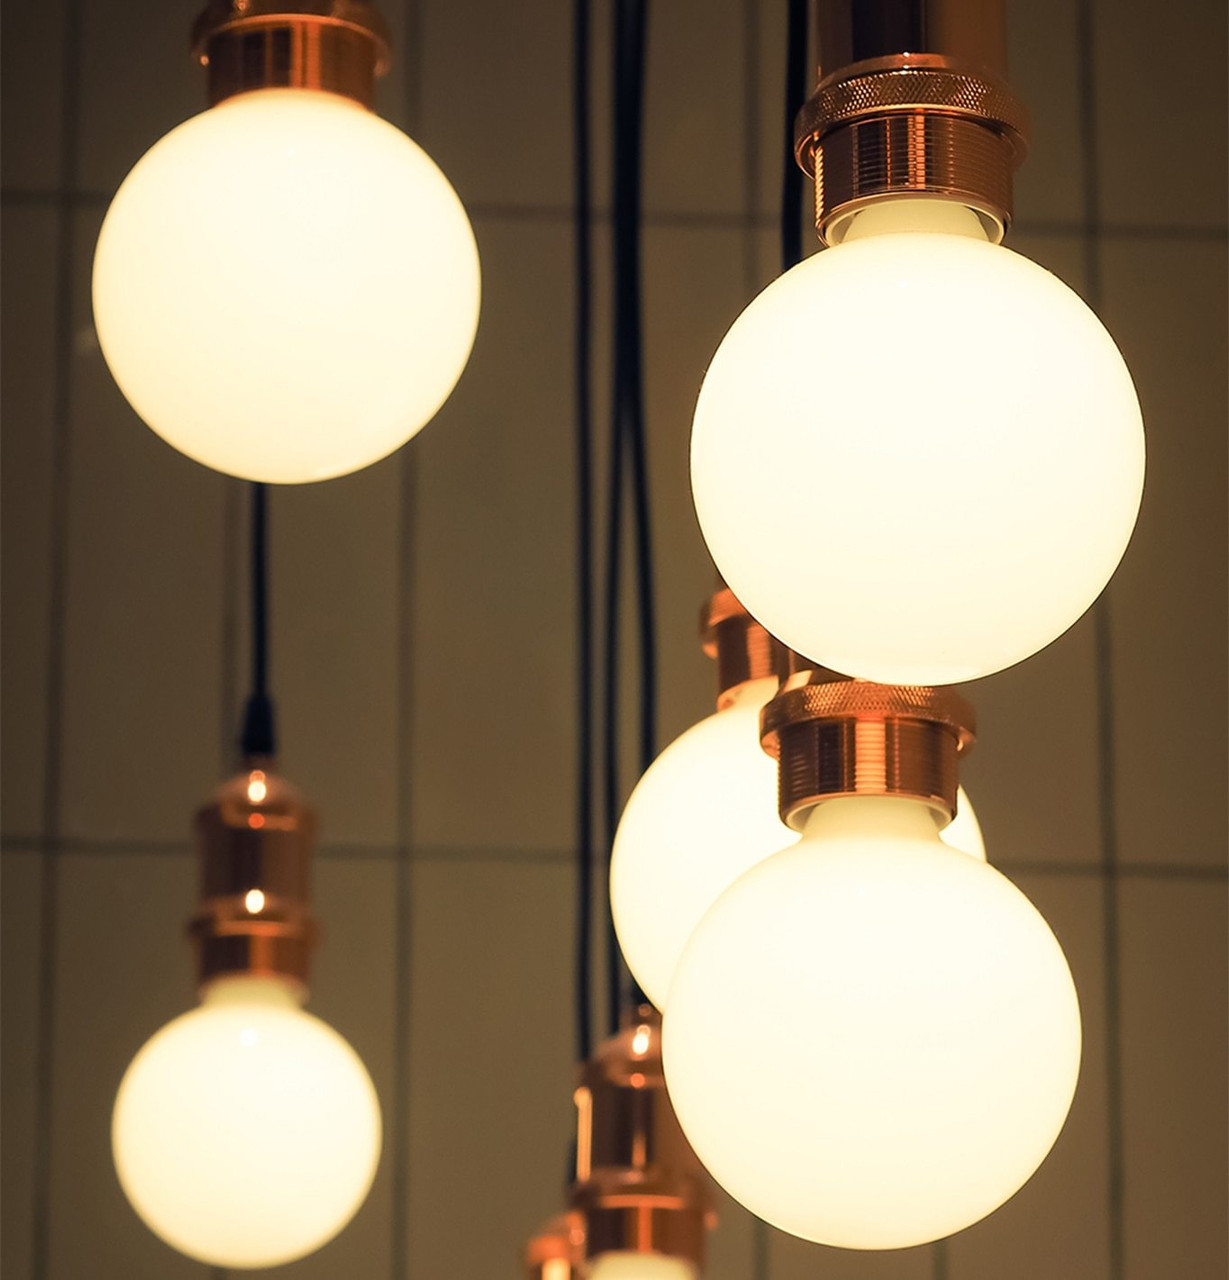 LED Globe Extra Warm White Light Bulbs